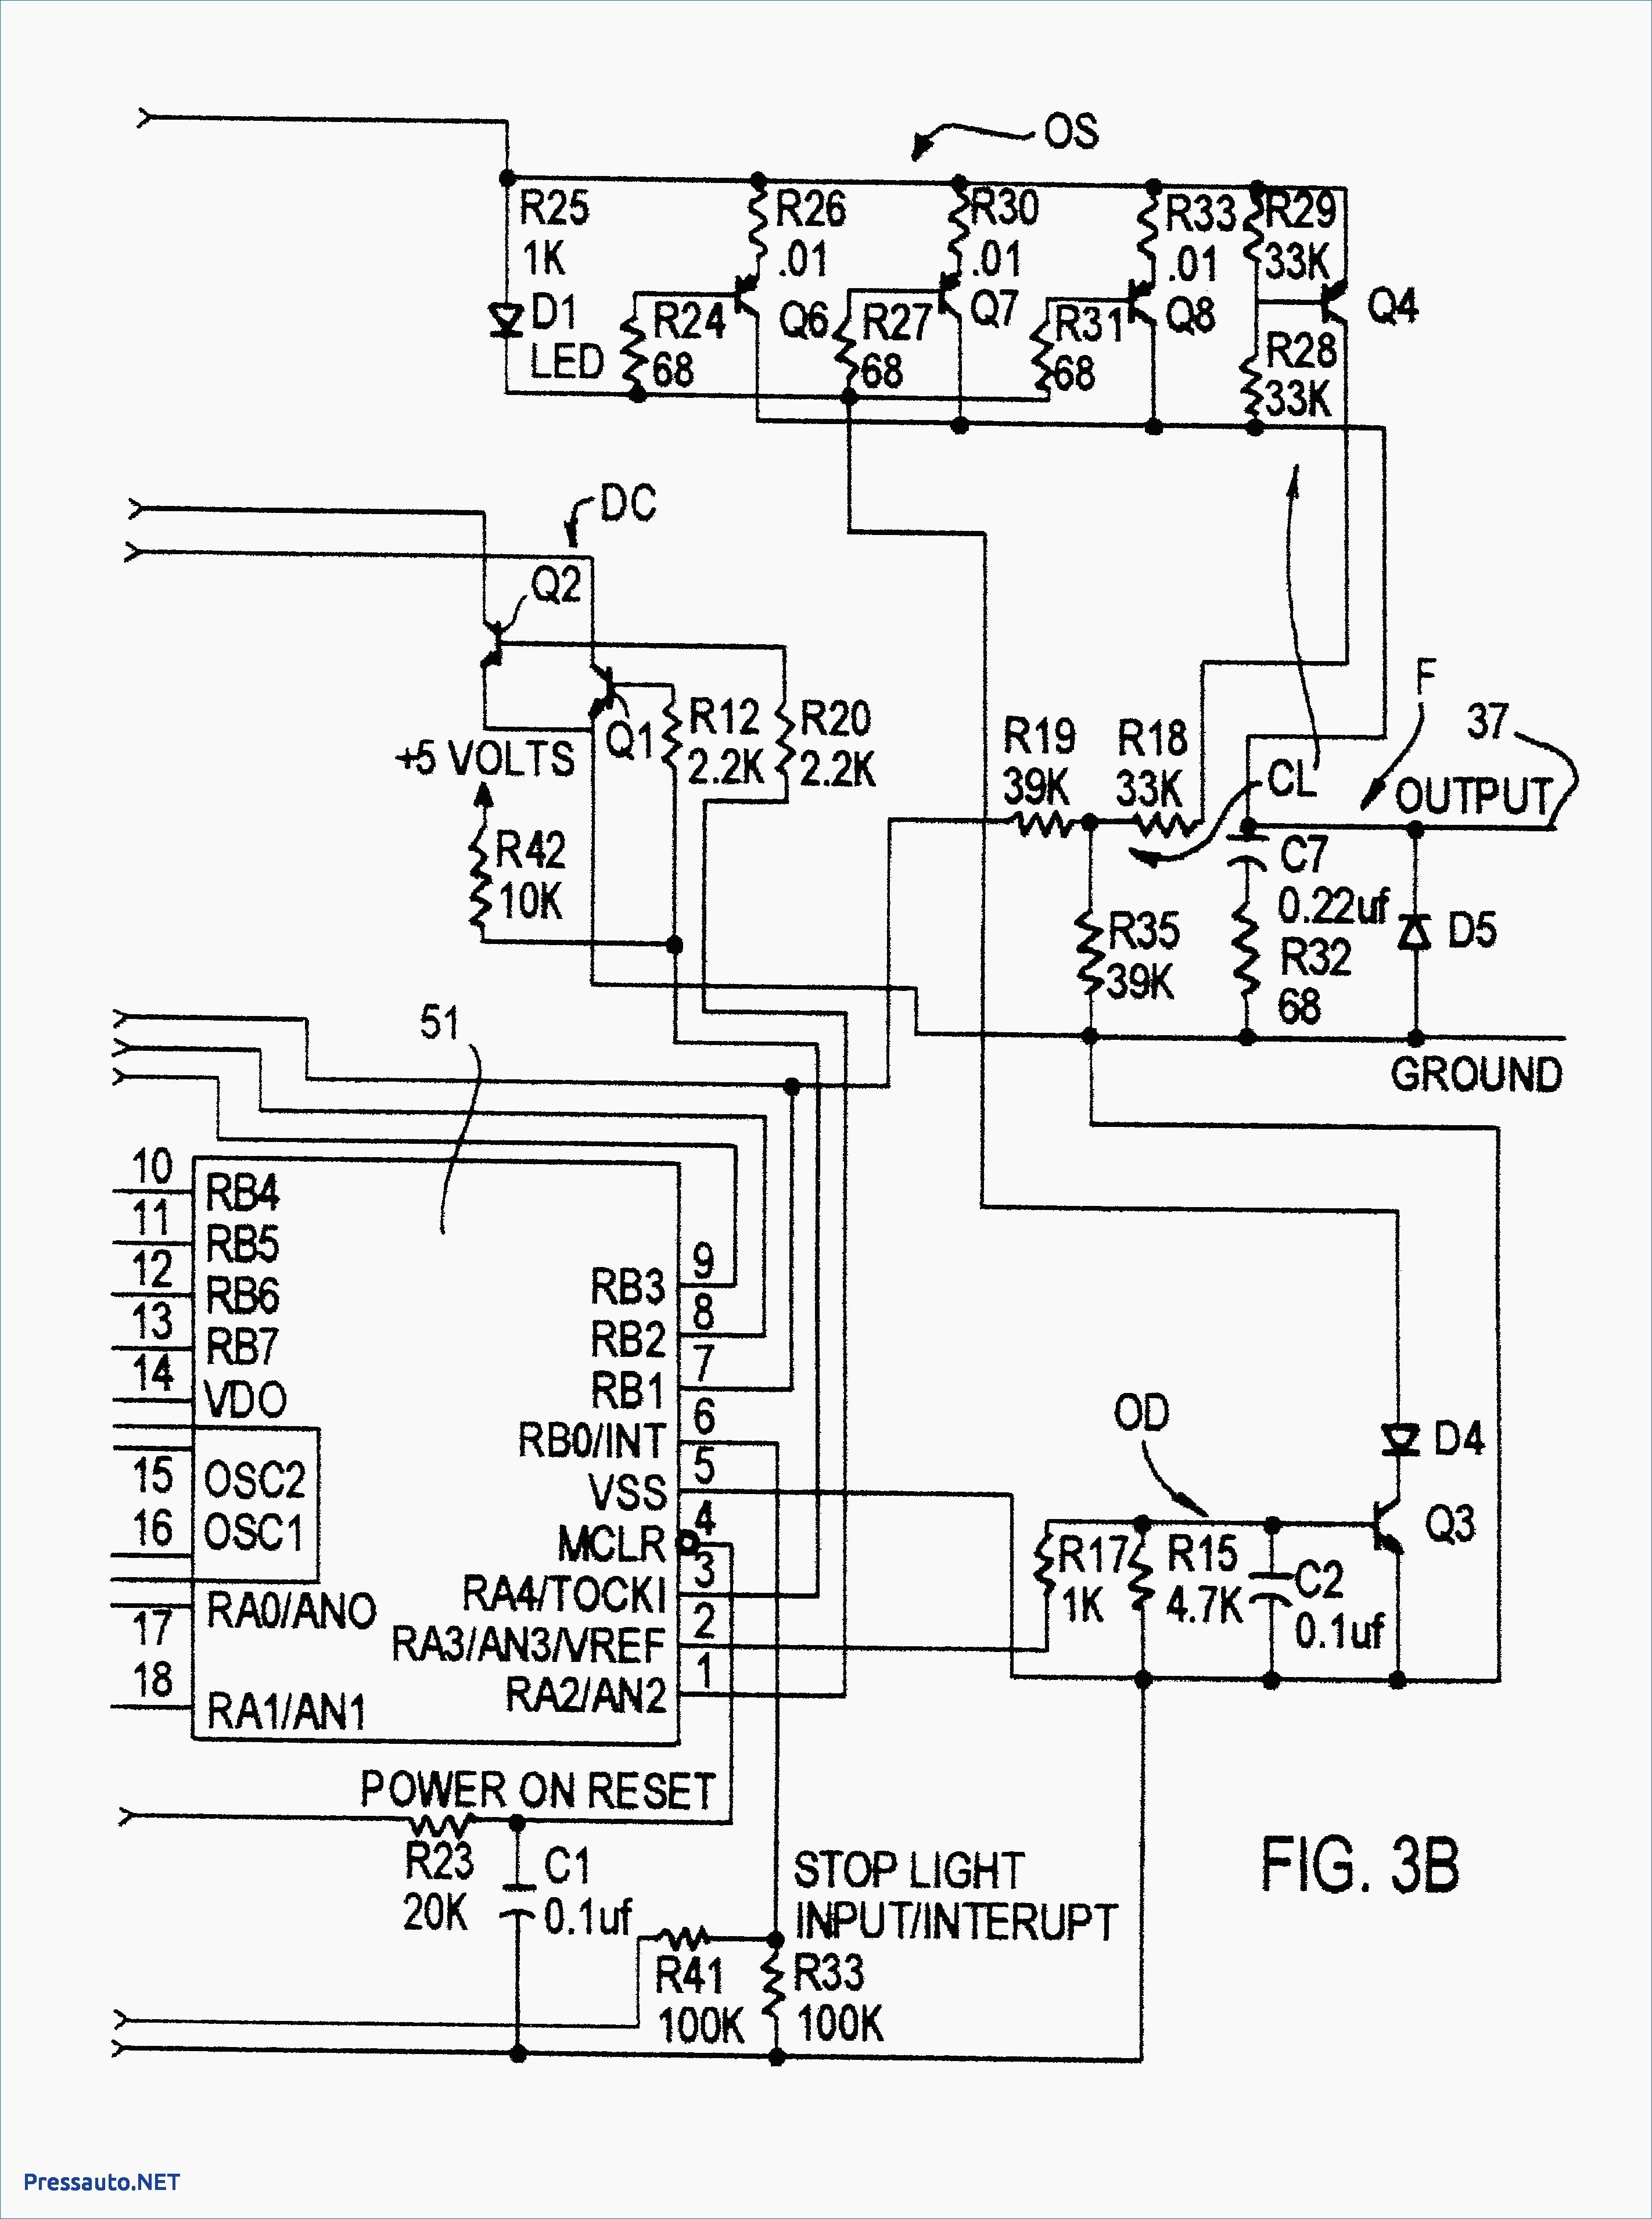 Car Amplifier Circuit Diagram Wiring Diagram Booster Amplifier Best 50 Amp Wiring Diagram New Of Car Amplifier Circuit Diagram